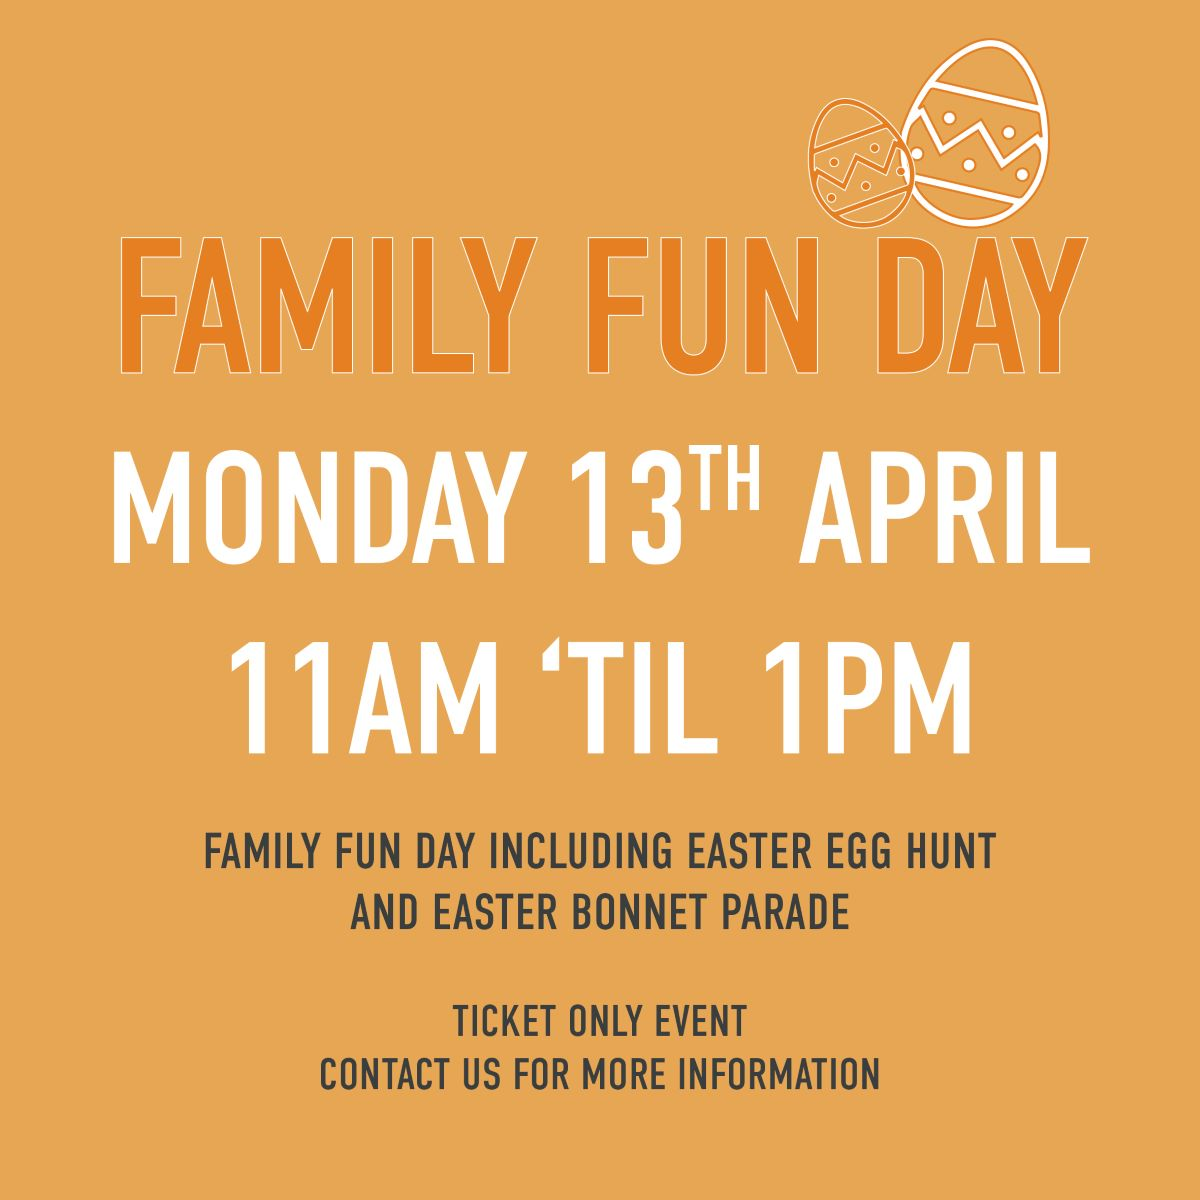 Family Fun Day Easter Millhouse